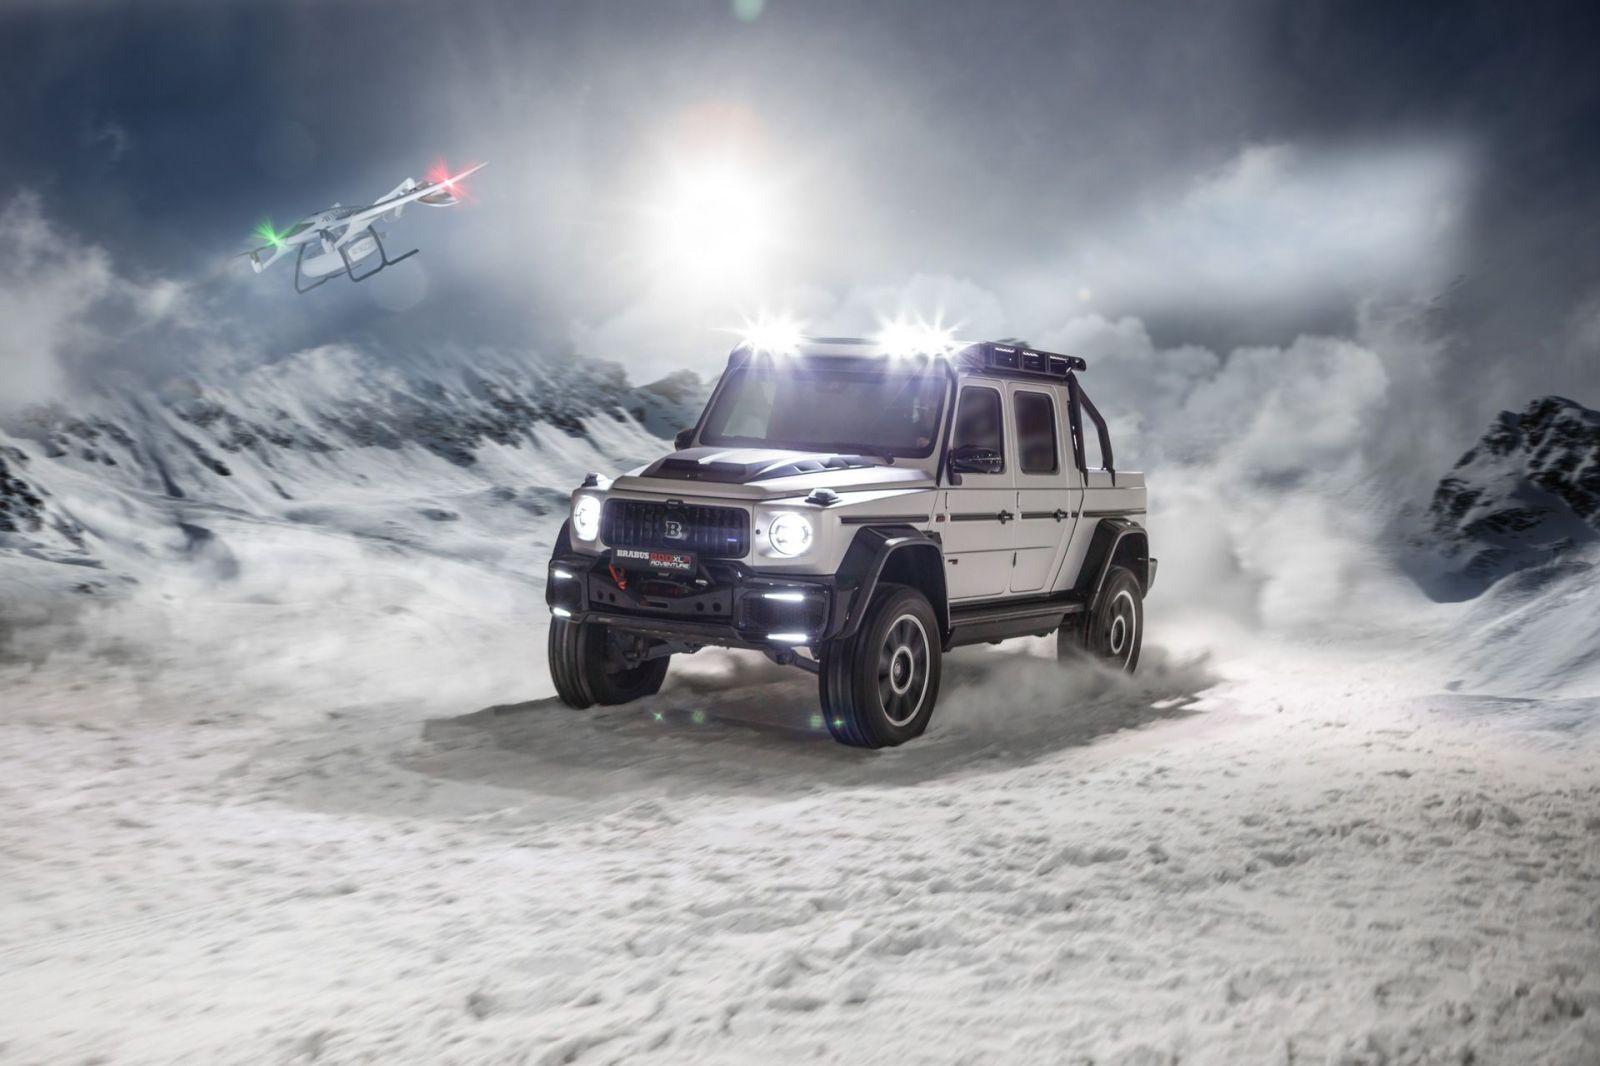 Brabus Mercedes-Benz G63 beštia s dronom - Brabus 800 Adventure XLP